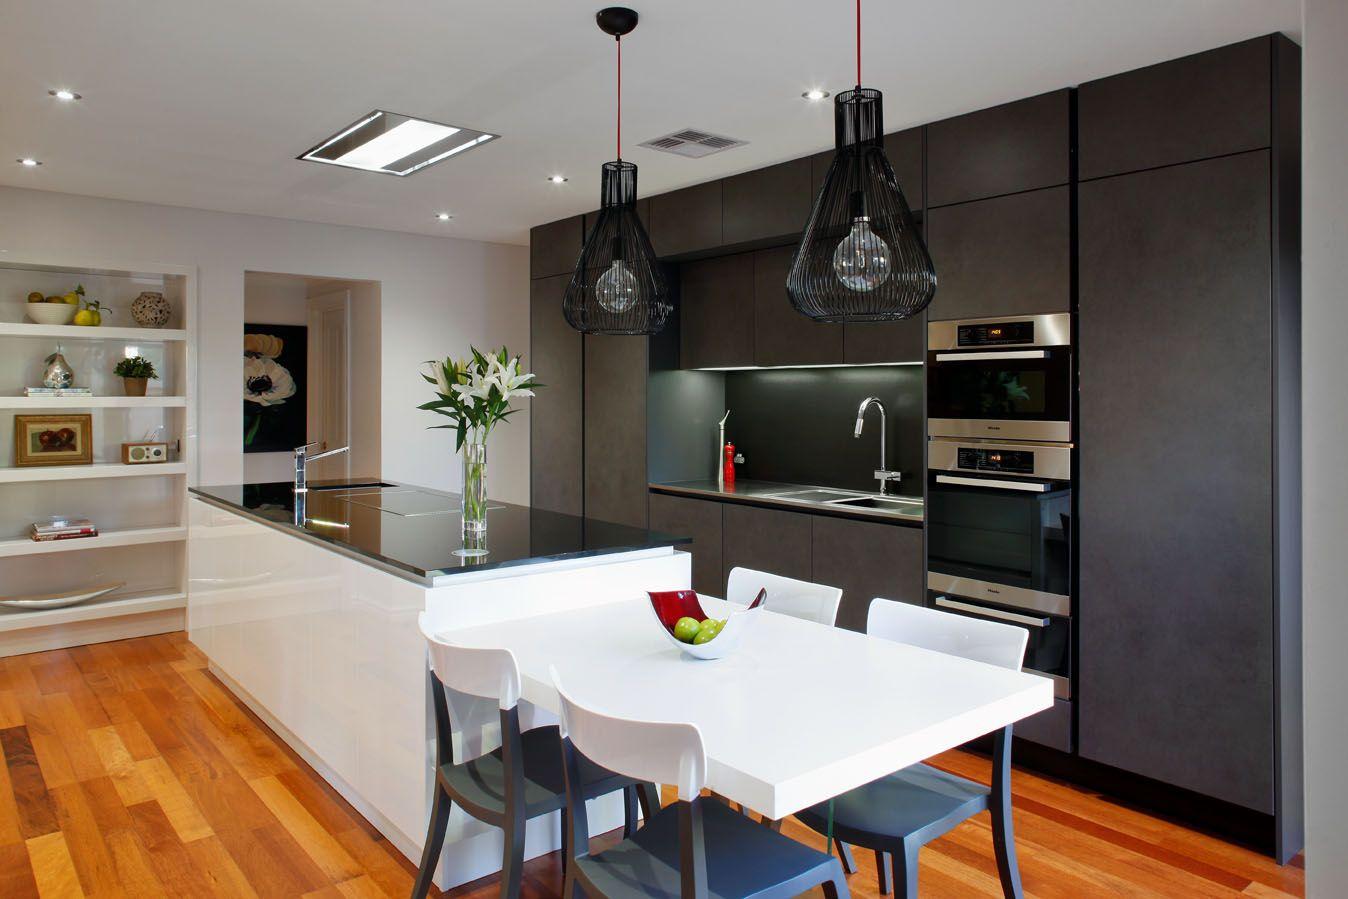 Kitchen designed and Installed by Retreat Design - Claremont